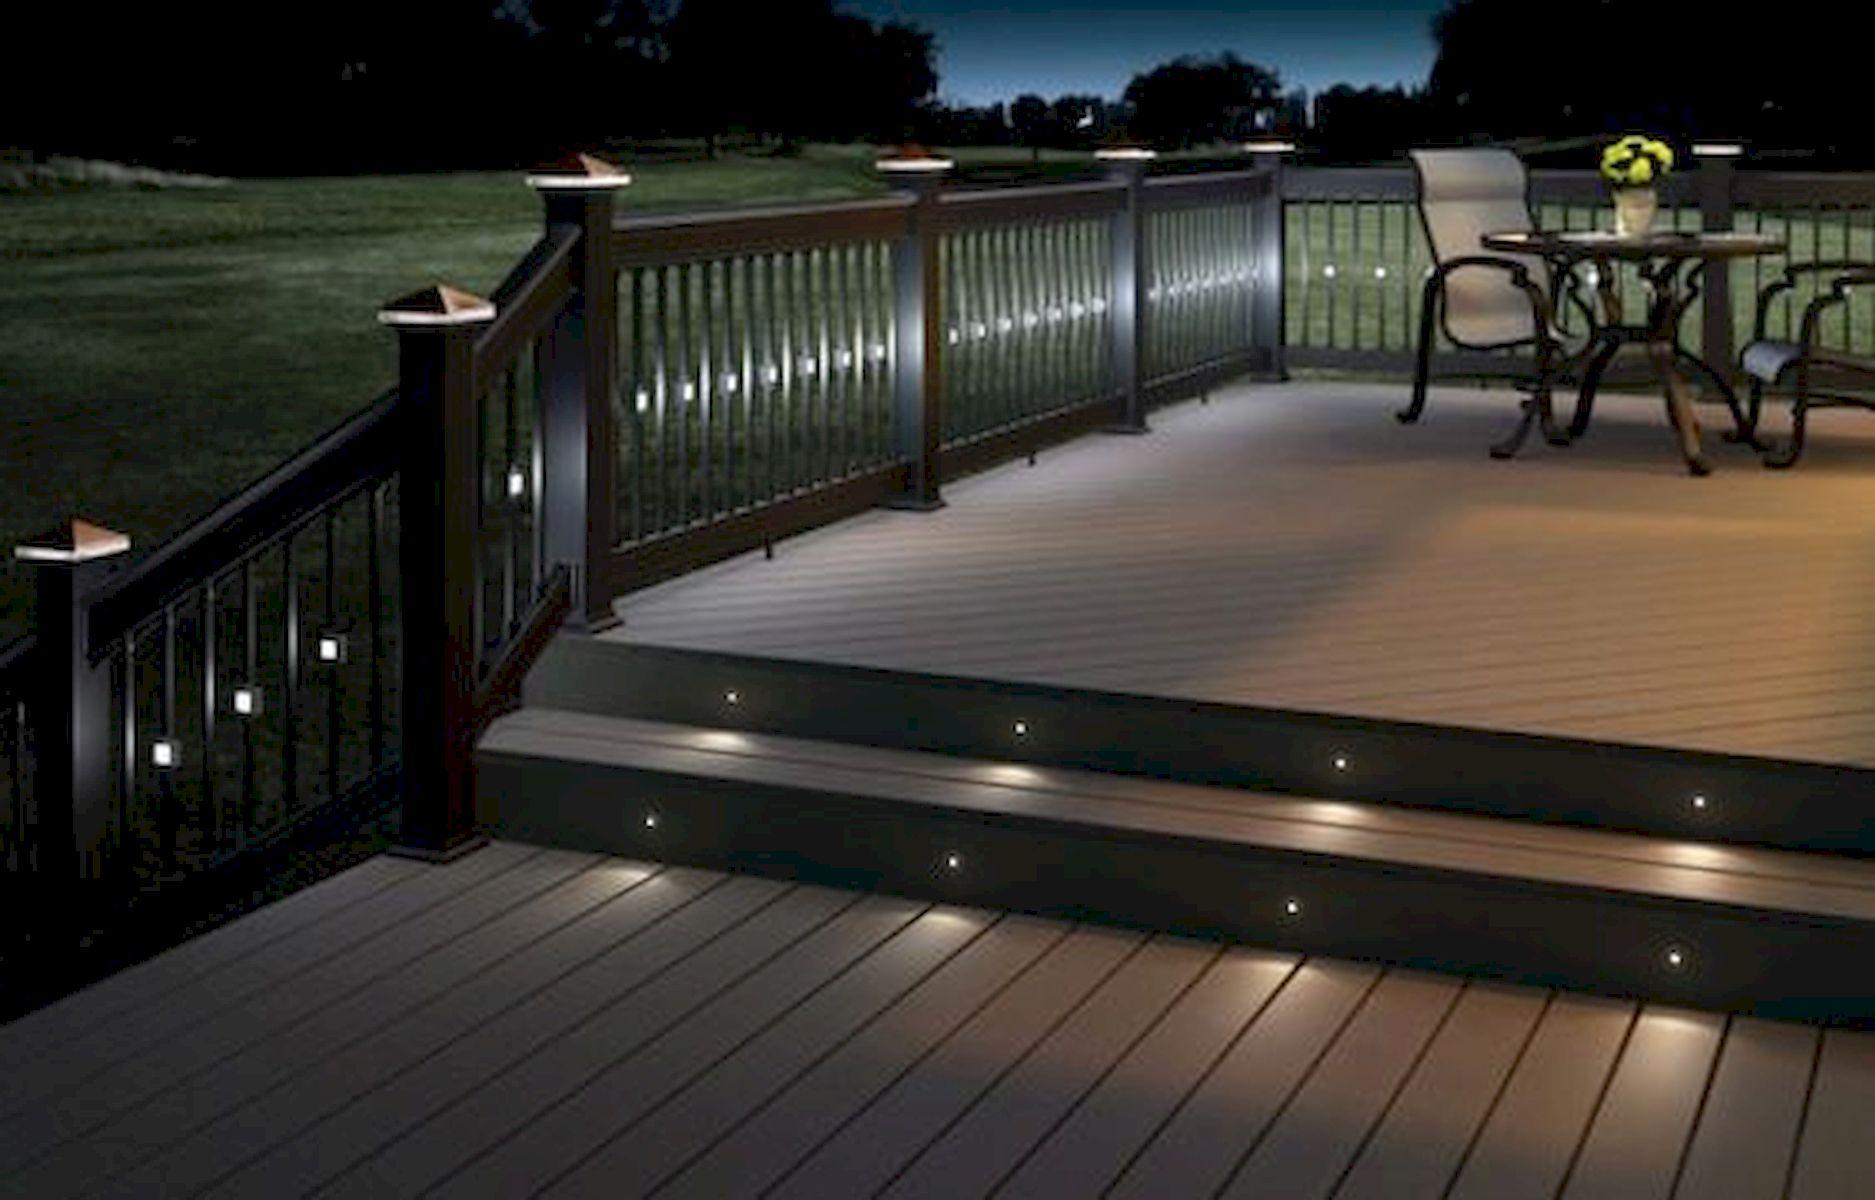 50 Fantastic Backyard Patio and Decking Design Ideas (39)